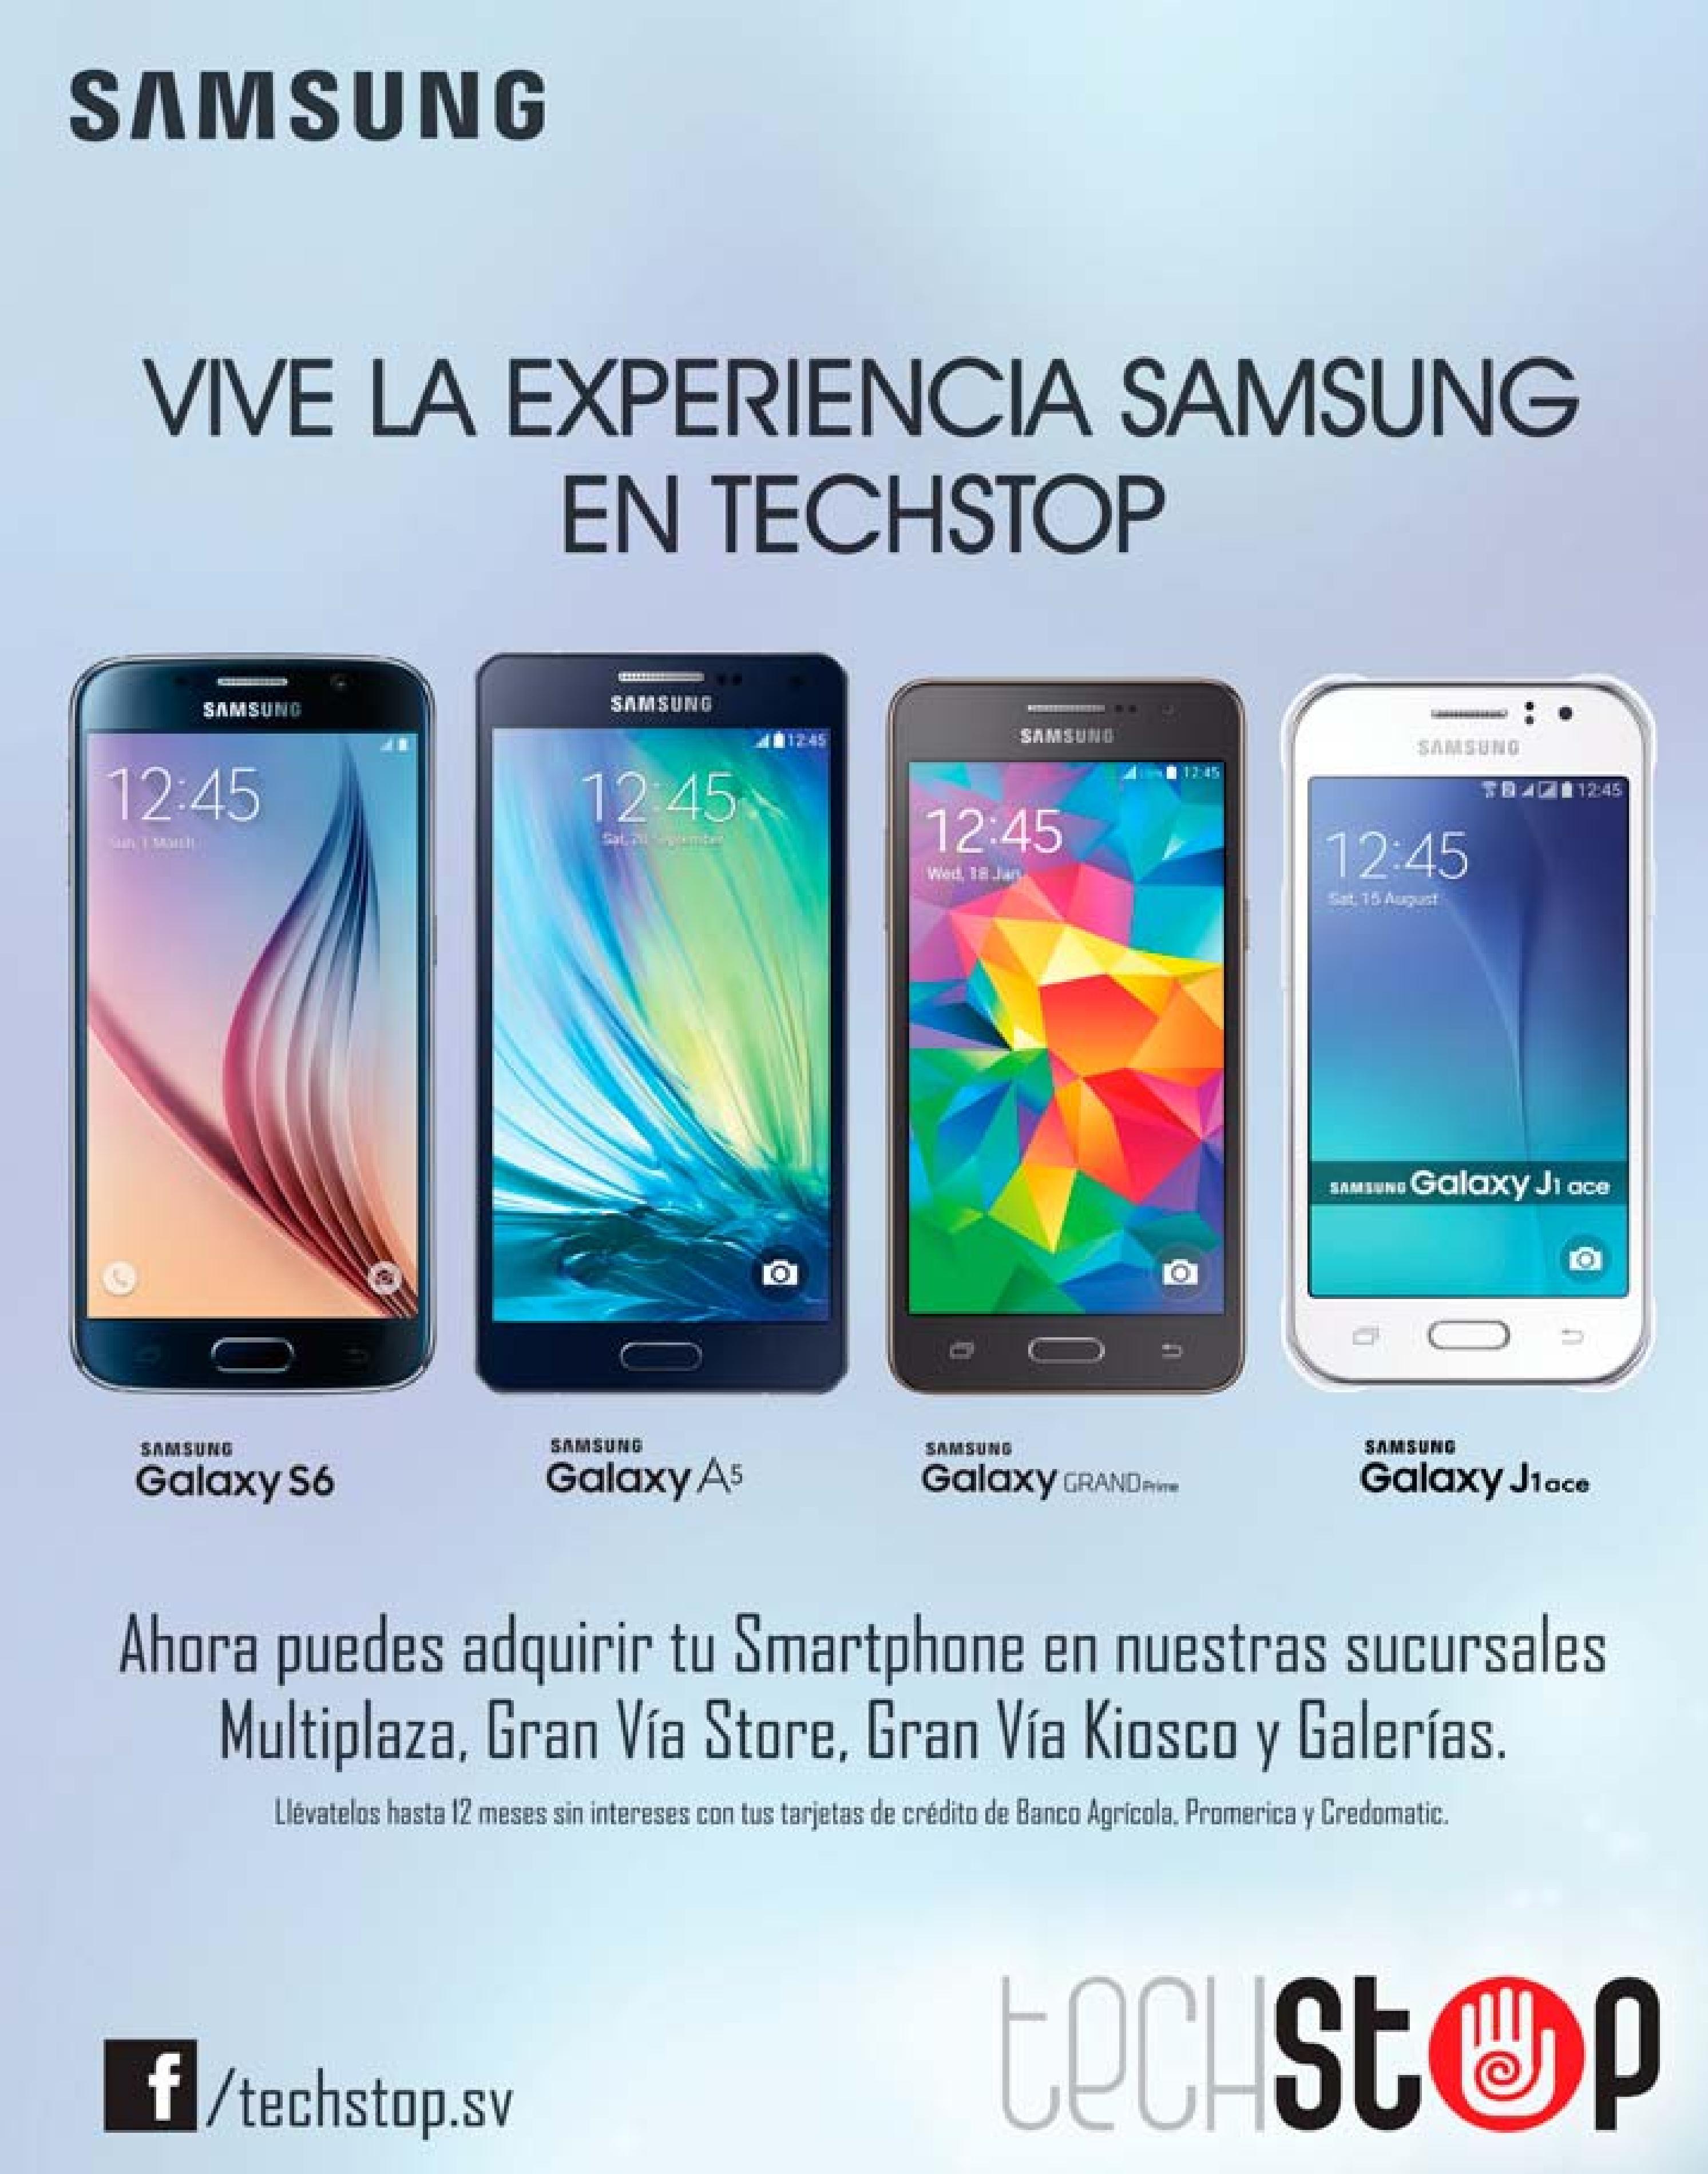 techstop el salvador smartphone accesories and phones